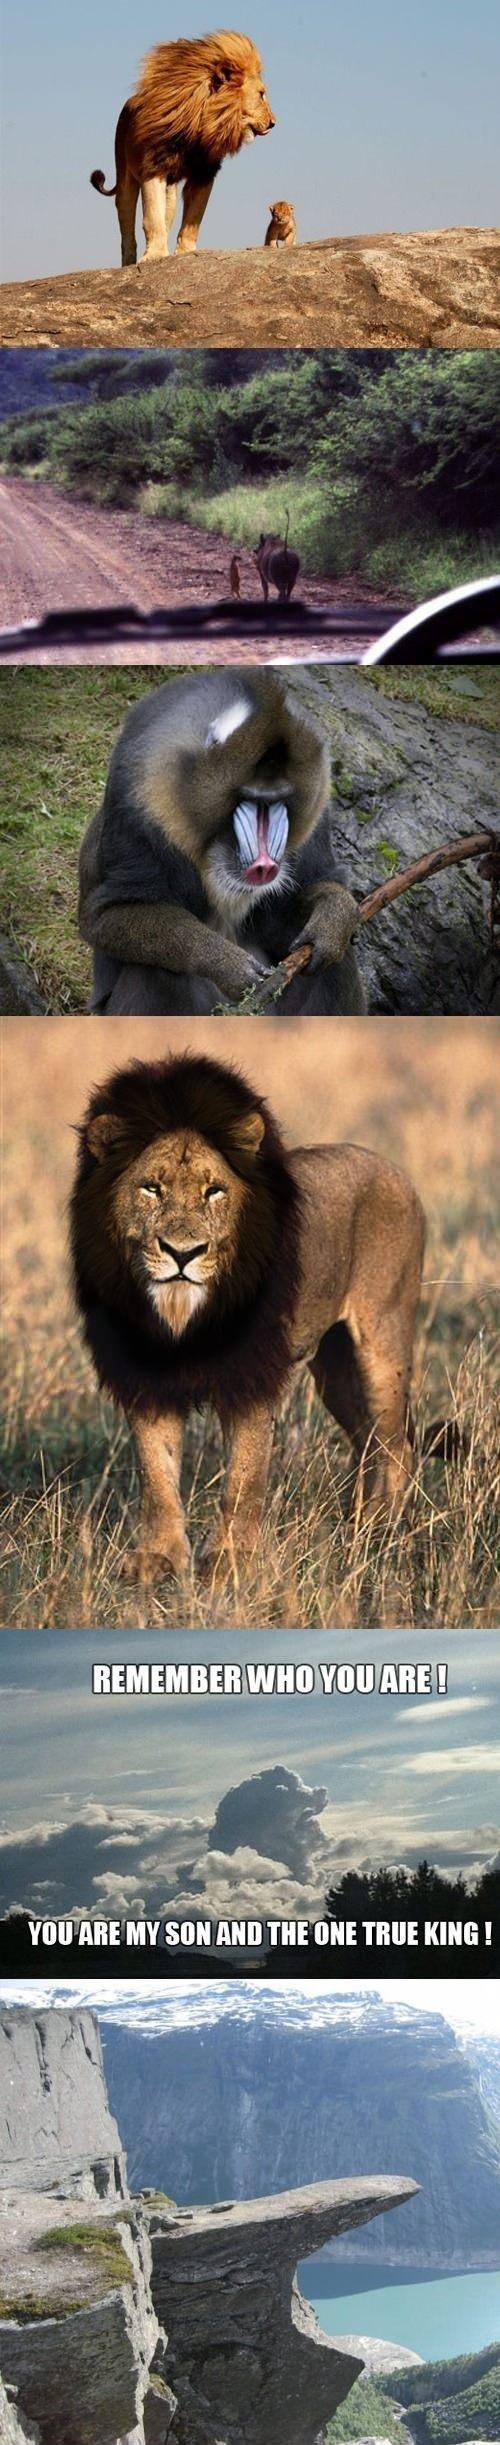 The Lion King. . maam:; mau mrm MY Soil mm m UNI TRUE KING l